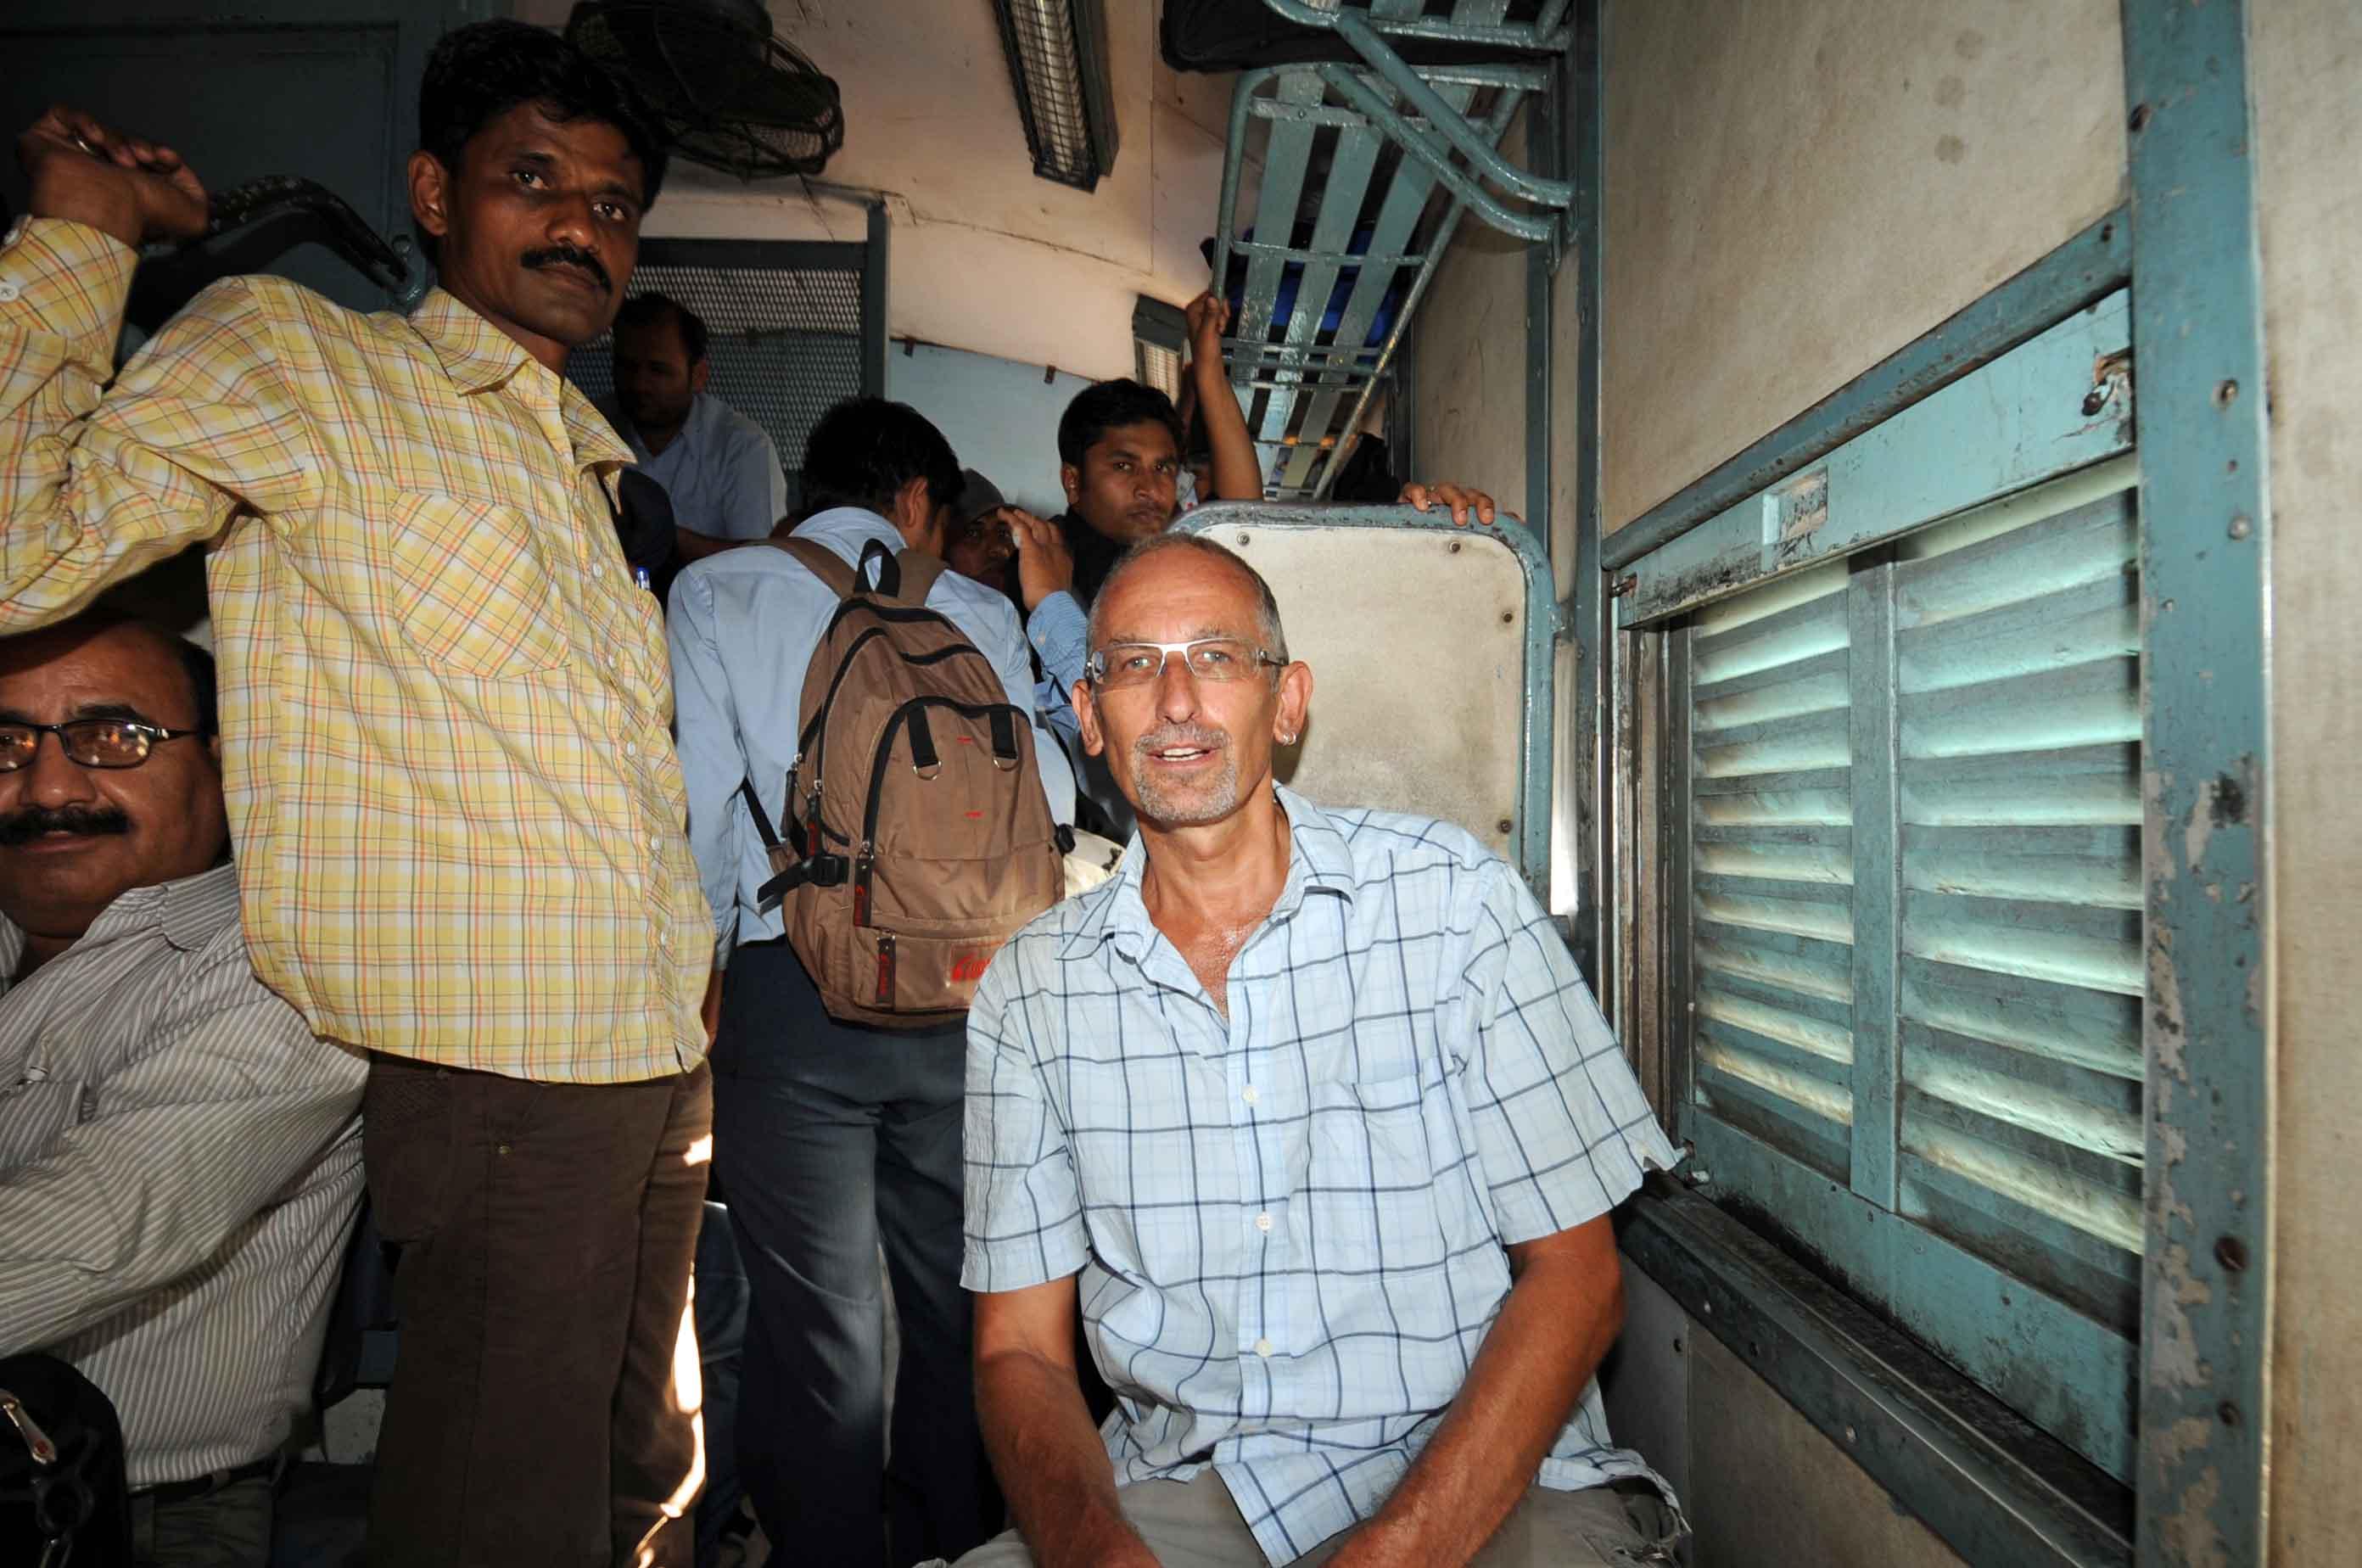 DG77491. Me on crowded train. Gujarat. India. 26.3.11crop